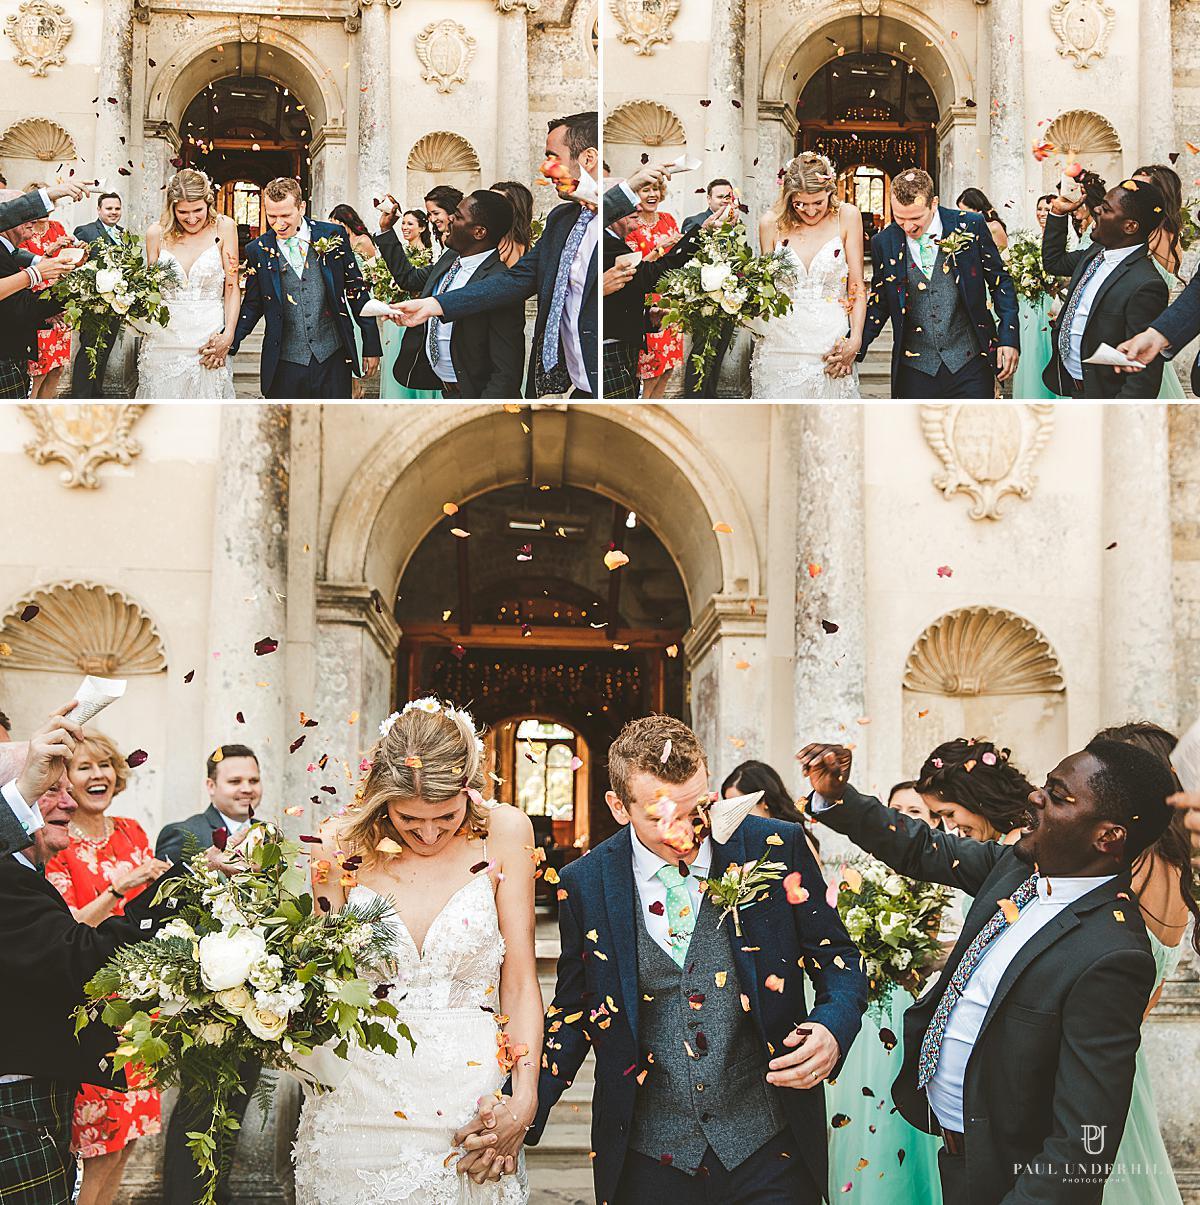 Lulworth Castle wedding